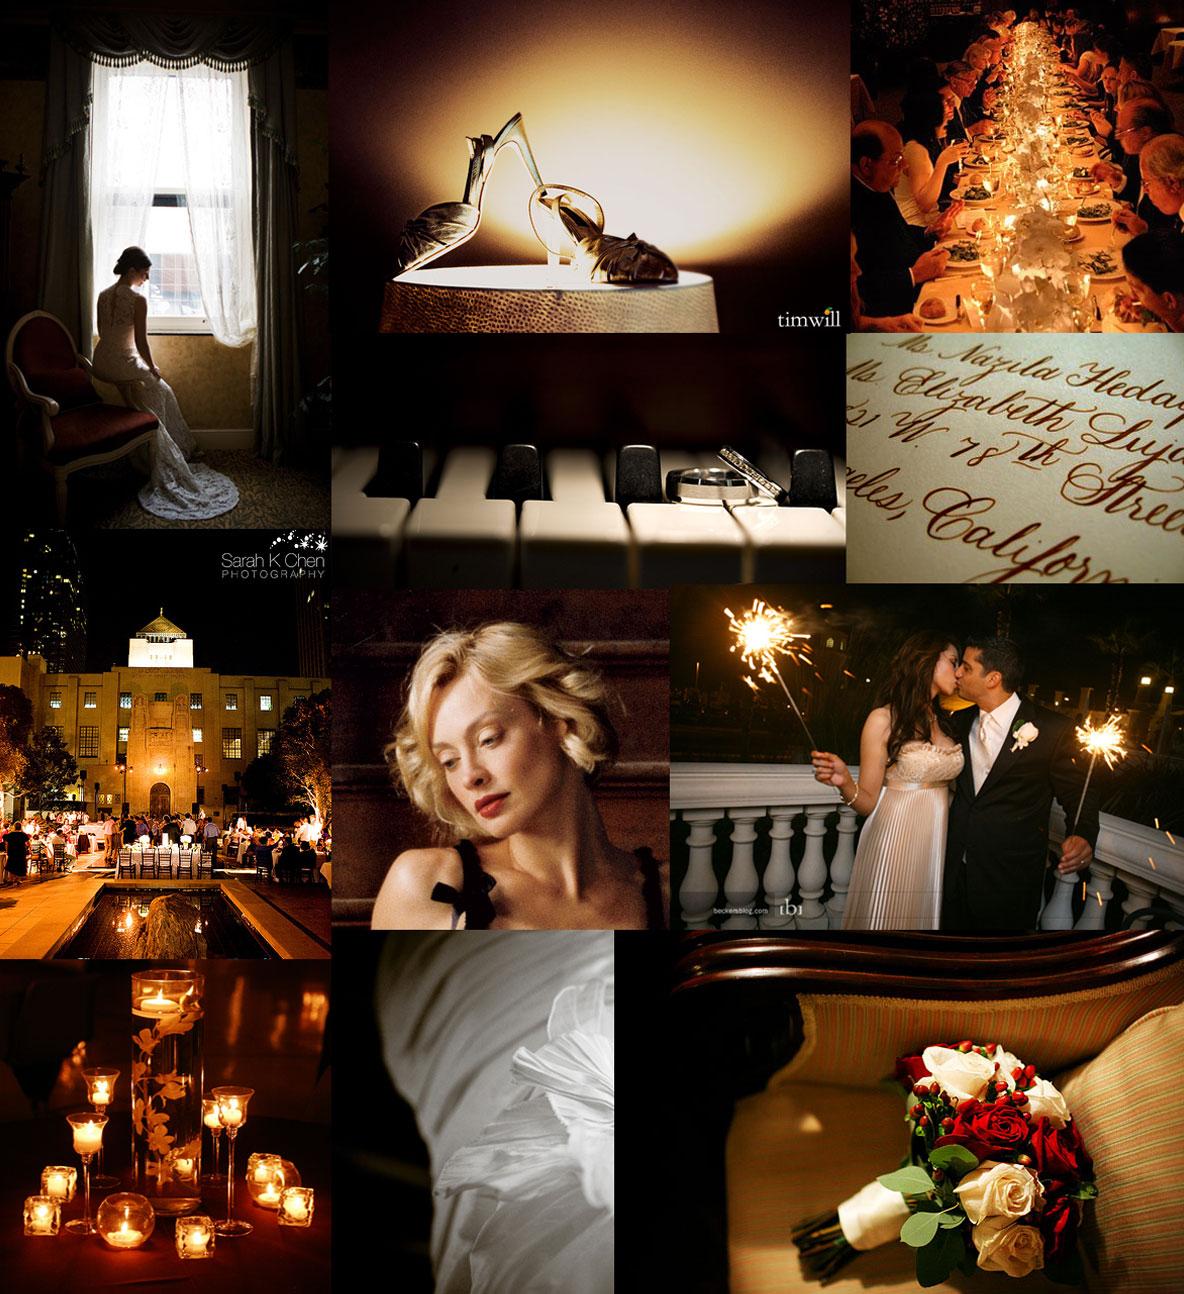 dark and elegant candlelight wedding inspiration board